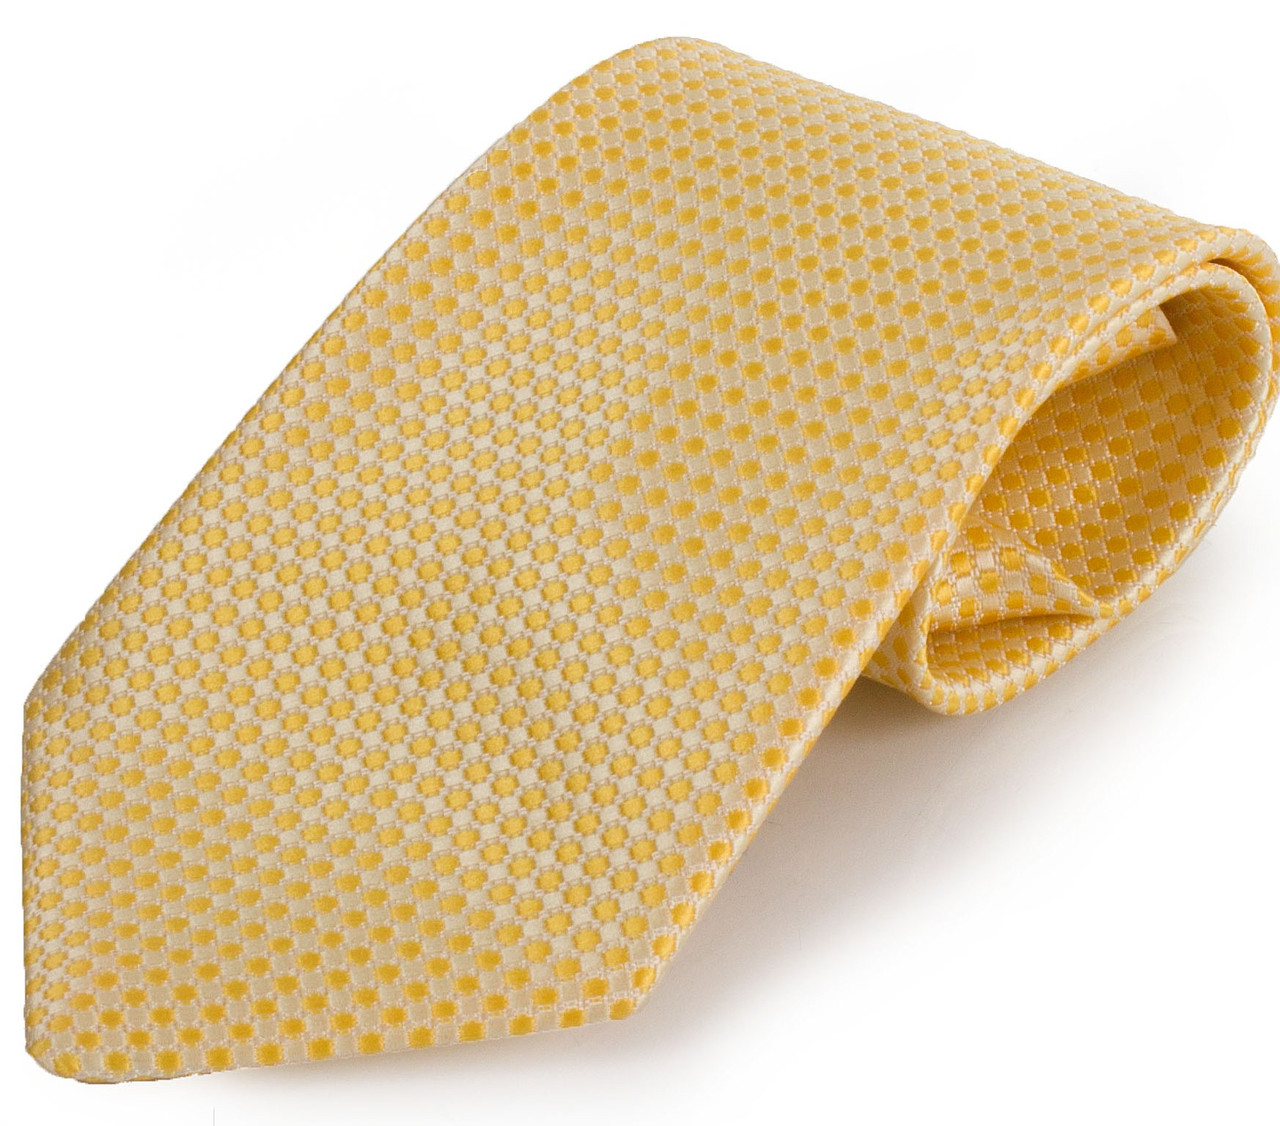 Сонячний дитячий краватка SCHONAU & HOUCKEN (ШЕНАУ & ХОЙКЕН) FAREDP-03 жовтий